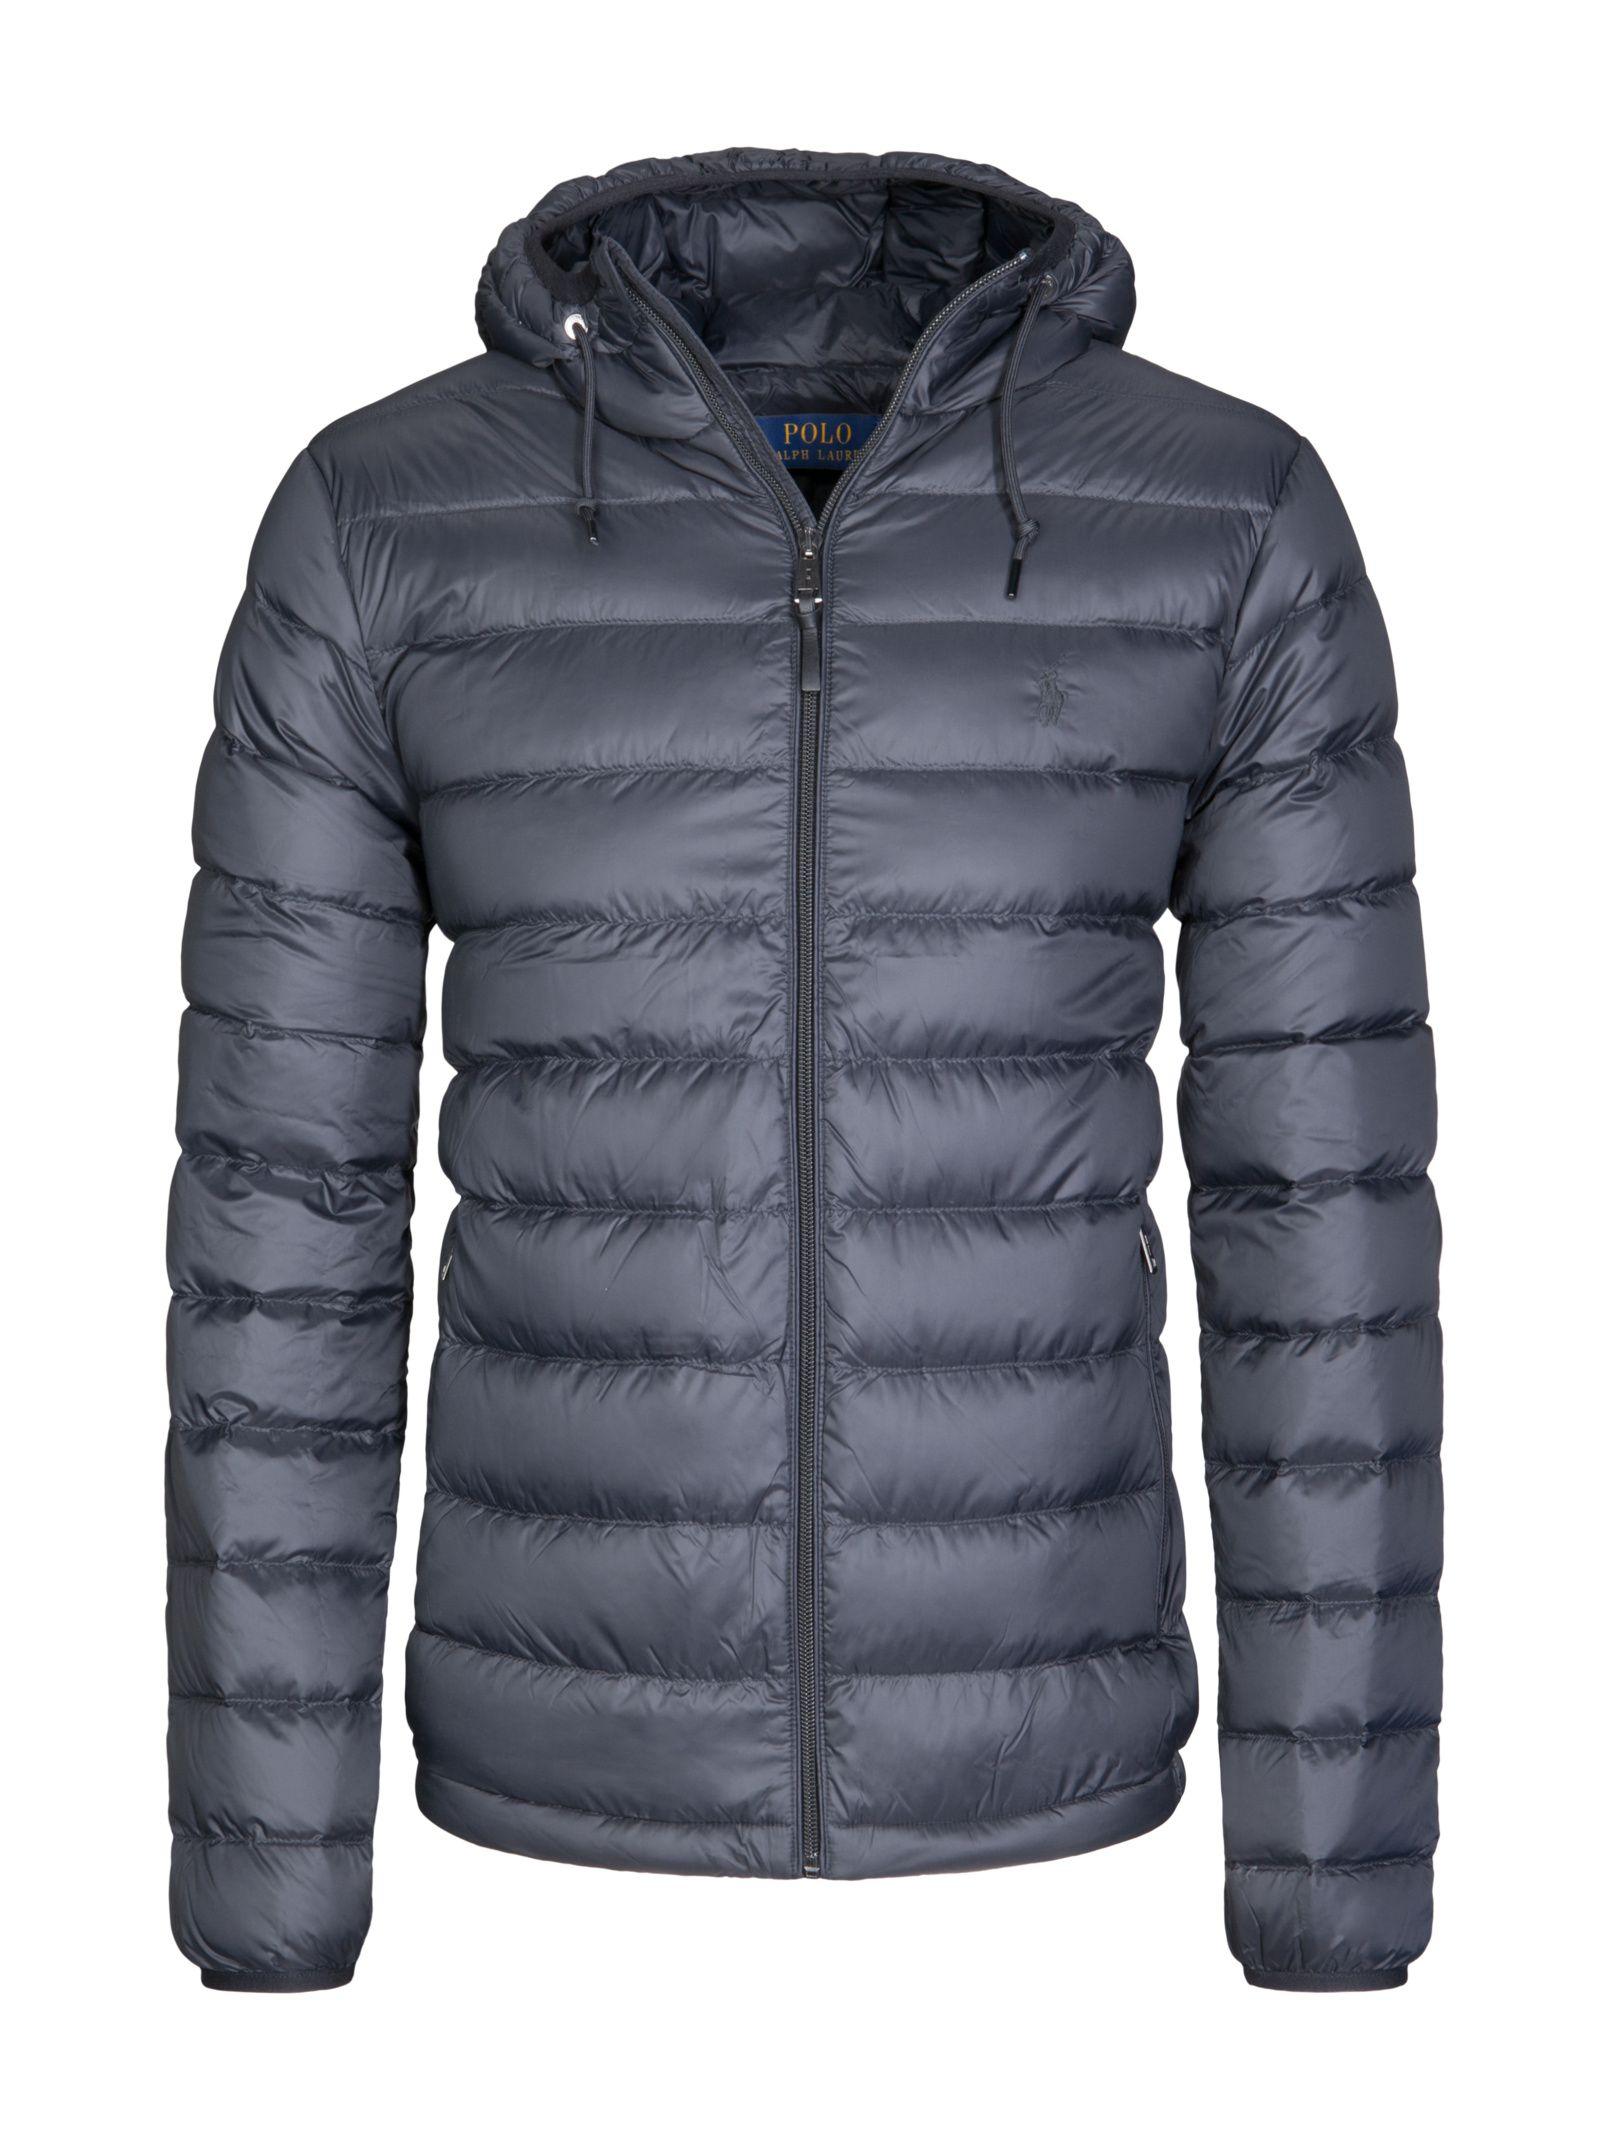 Polo Ralph Lauren Daunenblouson, schwarz in 2020   Jacken